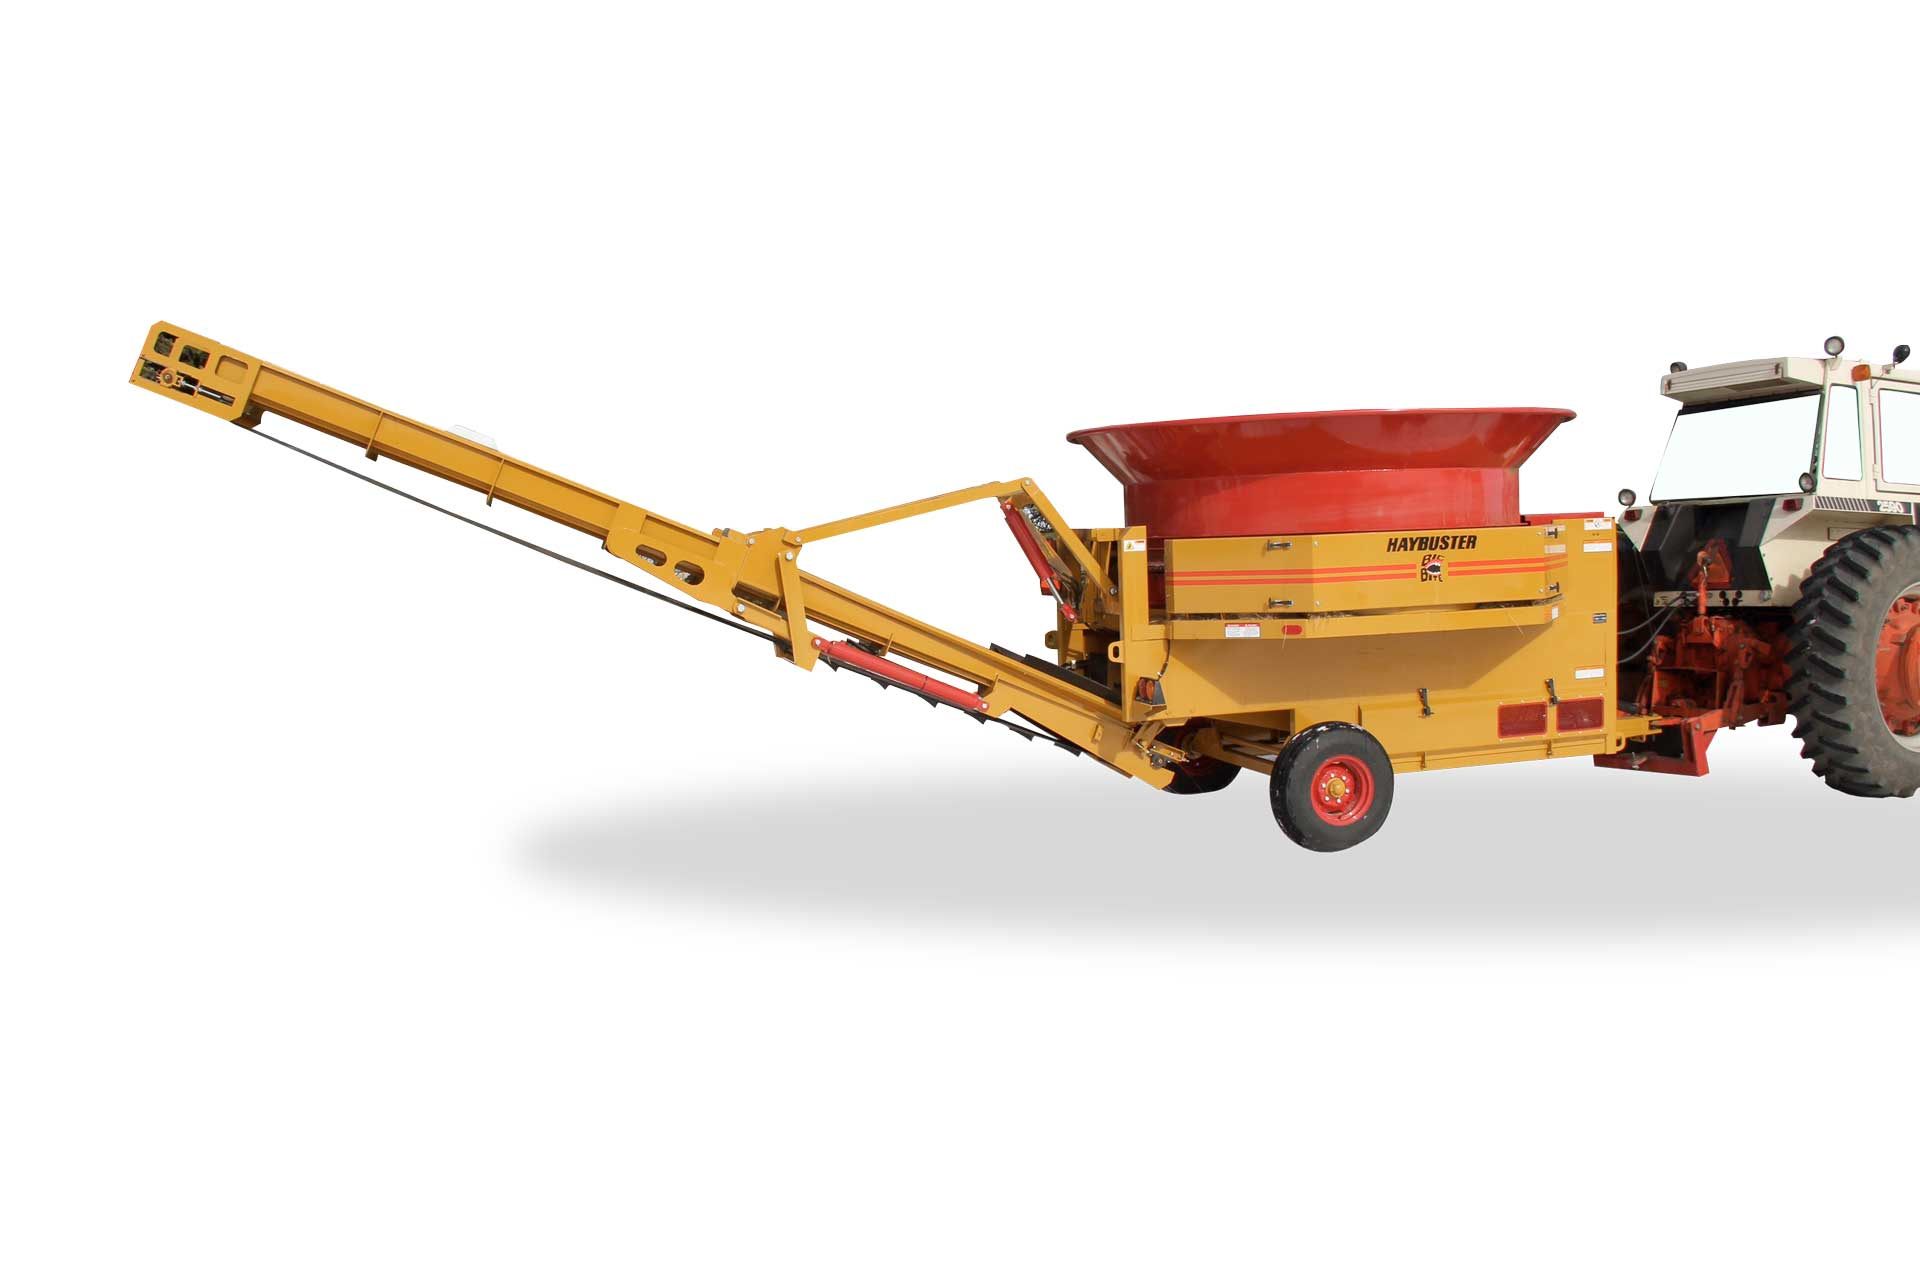 Haybuster H-1000 Moinho/Triturador de feno